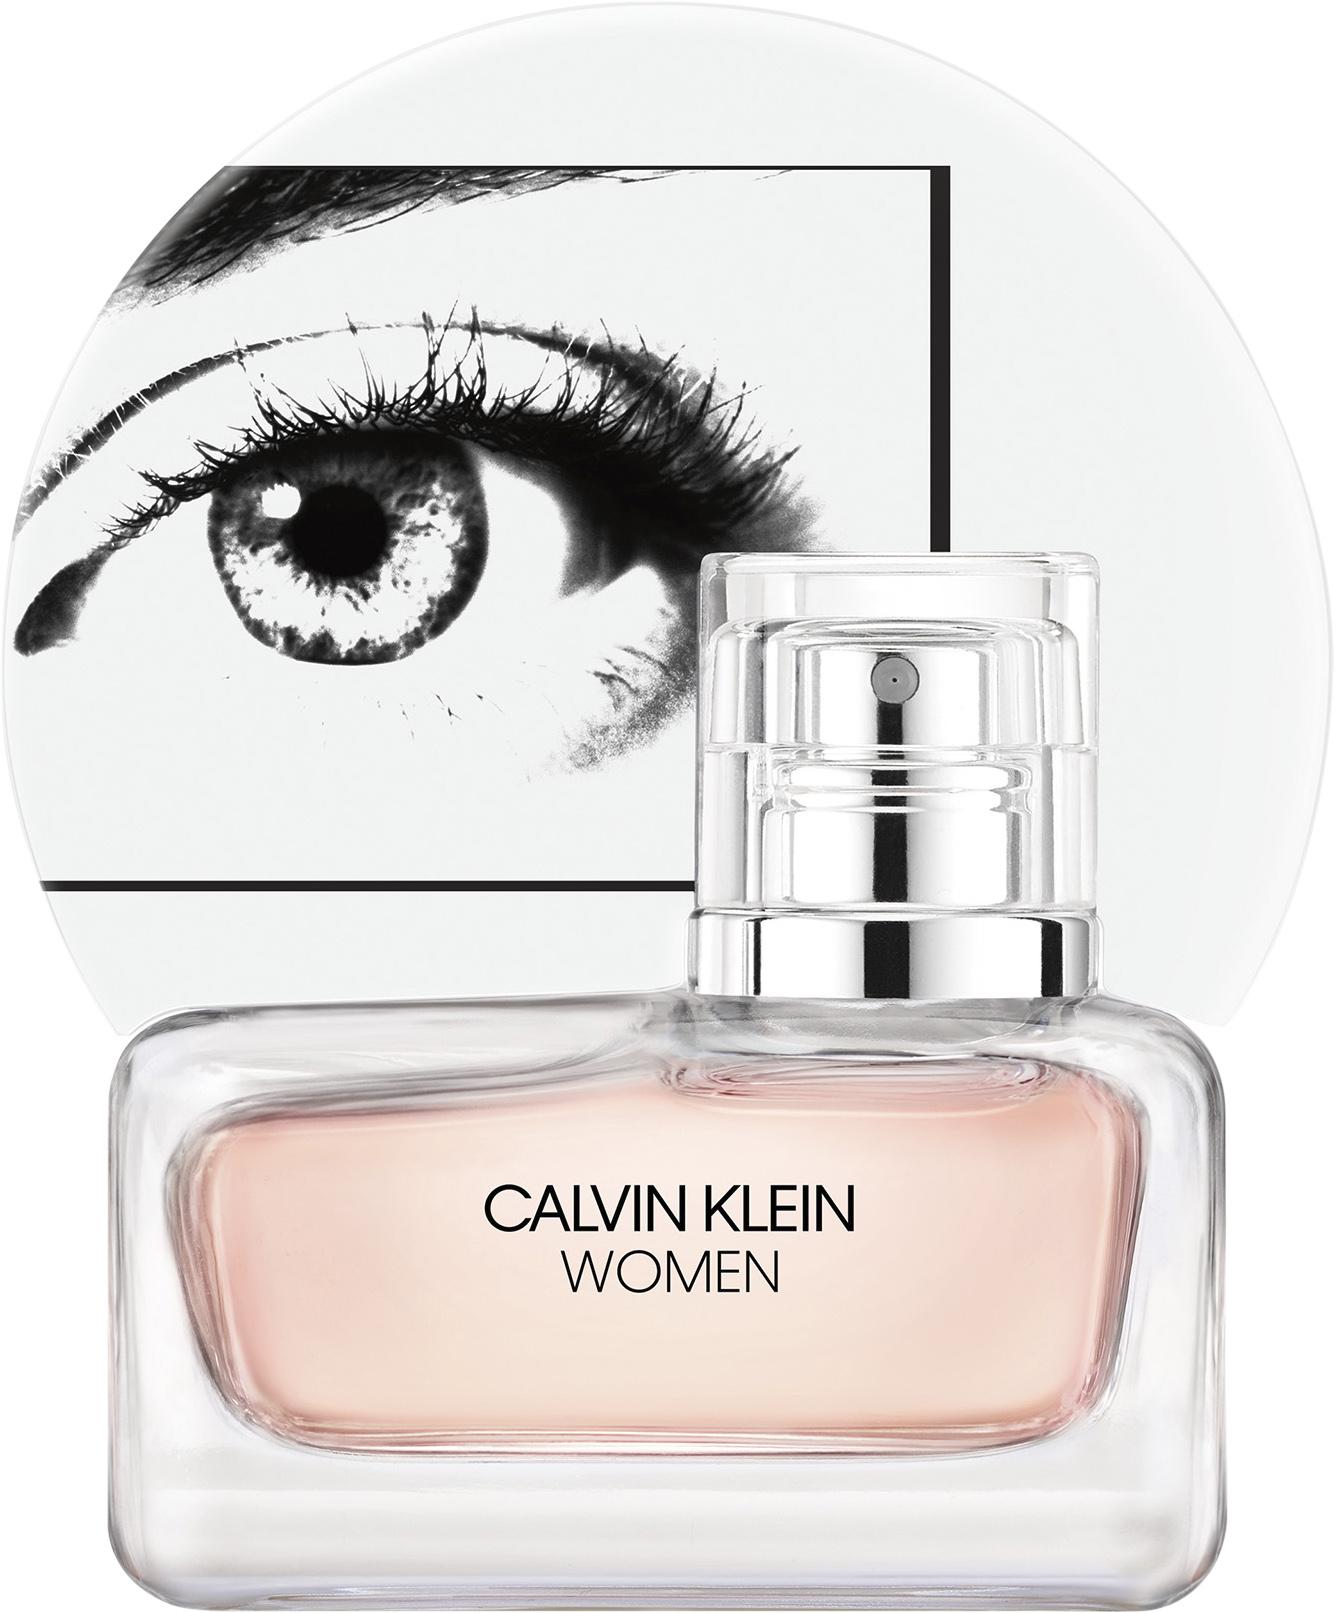 Calvin Klein - Women EDP 30 ml